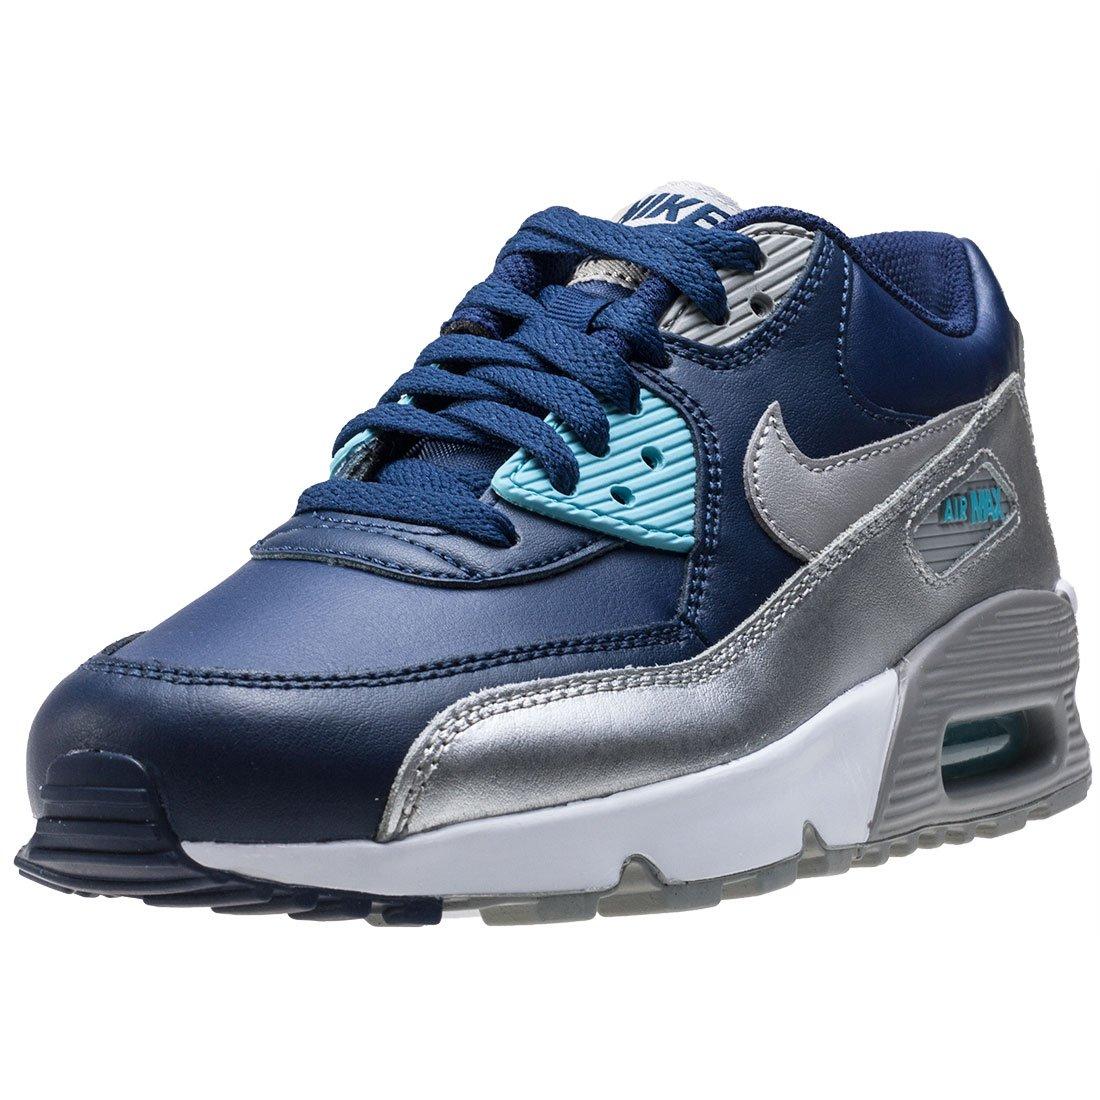 Nike AIR MAX 90 LTR (PS) Boys Running Shoes 833414 100_11C